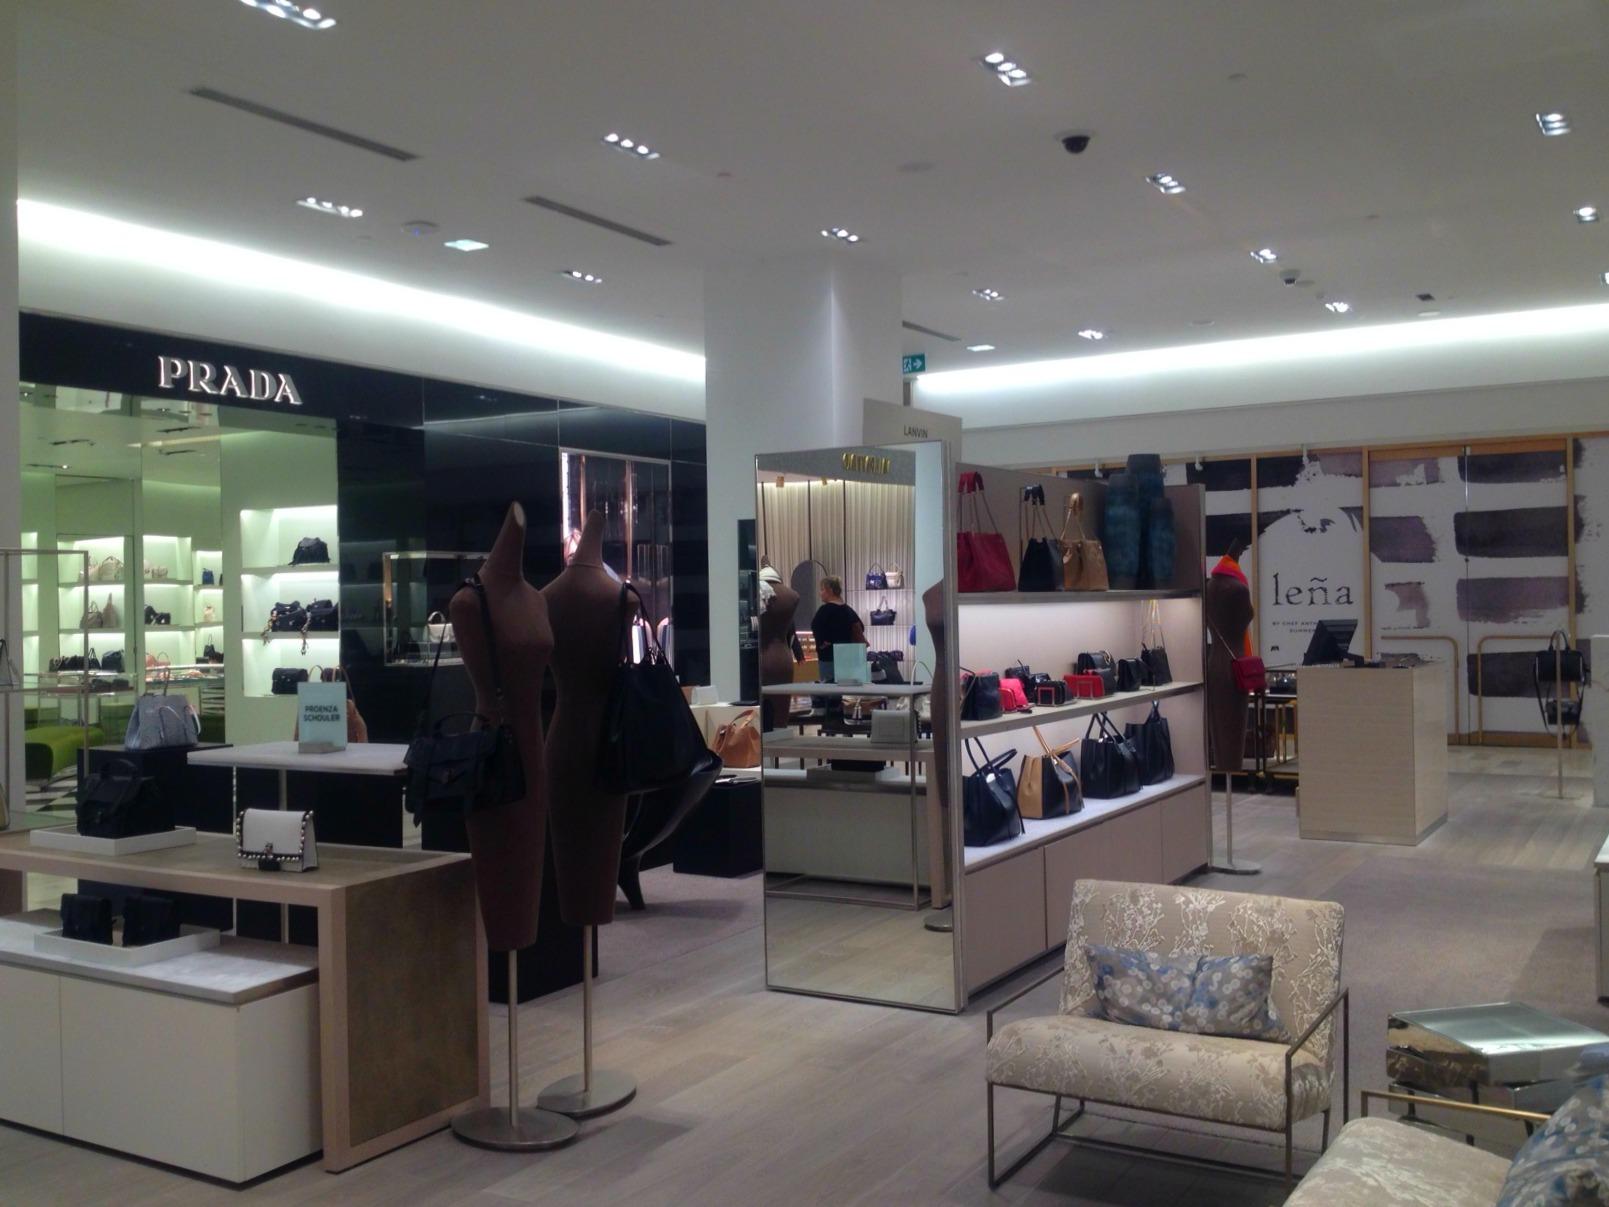 Prada is located beside Oliver & Bonacini's 3-level restaurant concept, Leña, opening soon.